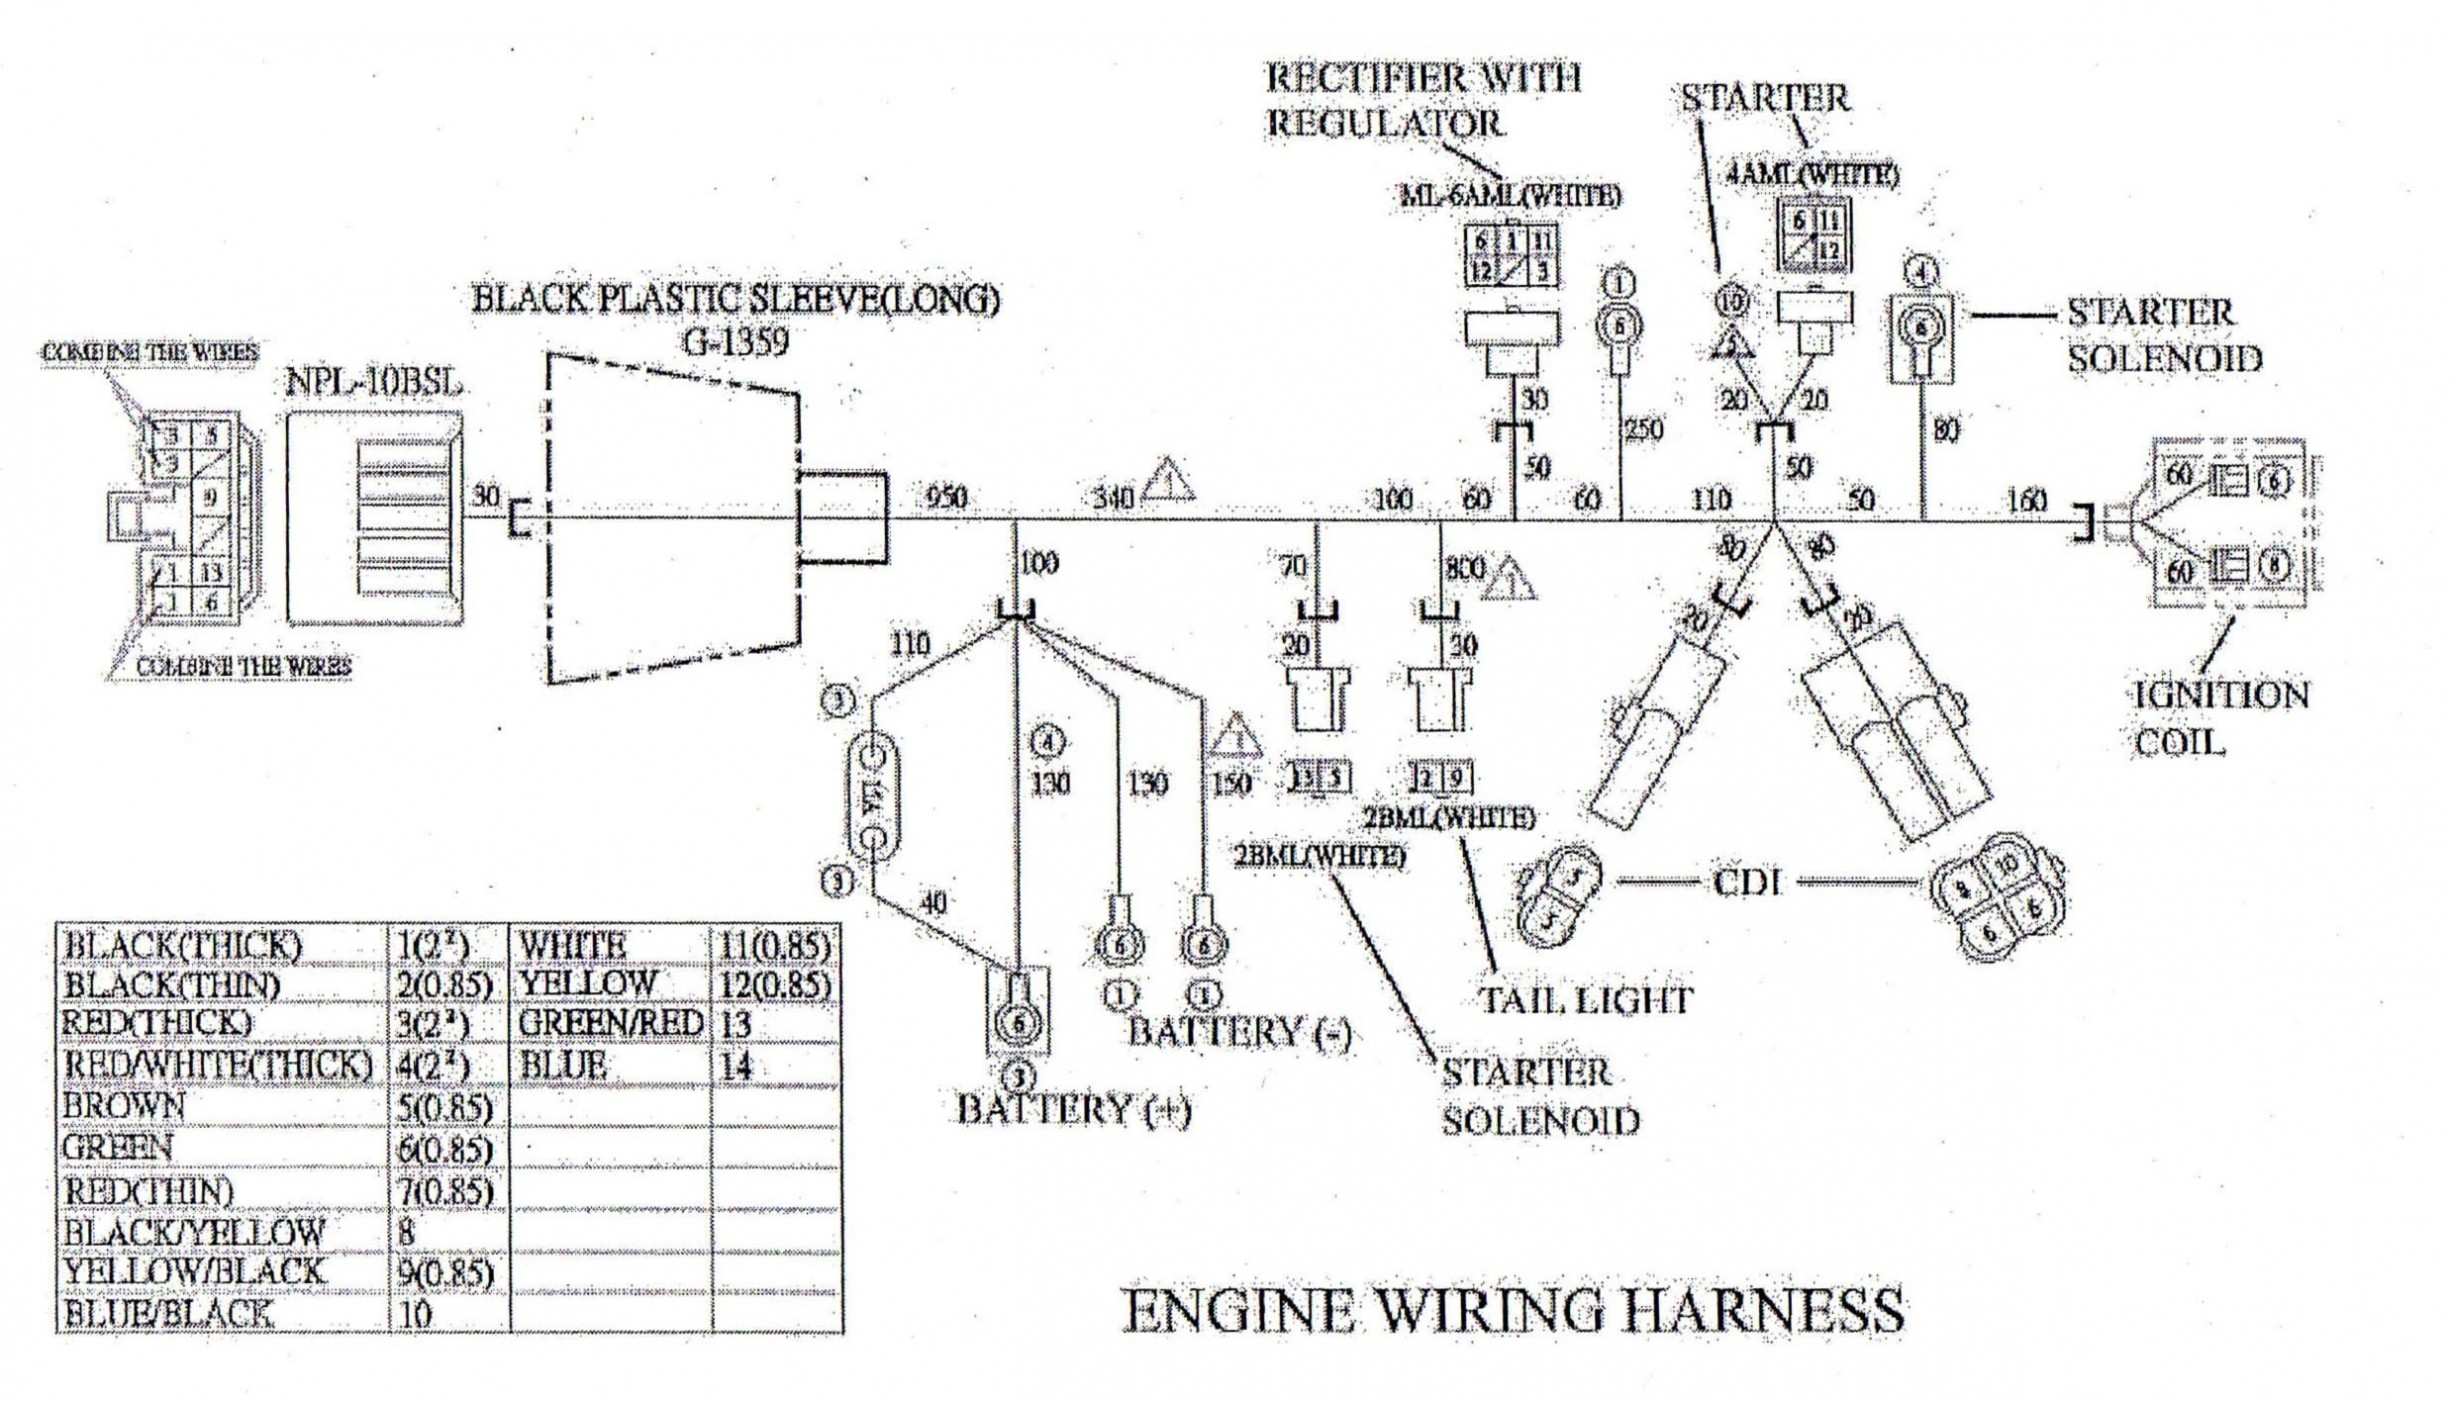 Basic Engine Diagram Hot Inch Diagram Best Rear Brake Drum Diagram ford Ranger 3 0d Brake Of Basic Engine Diagram